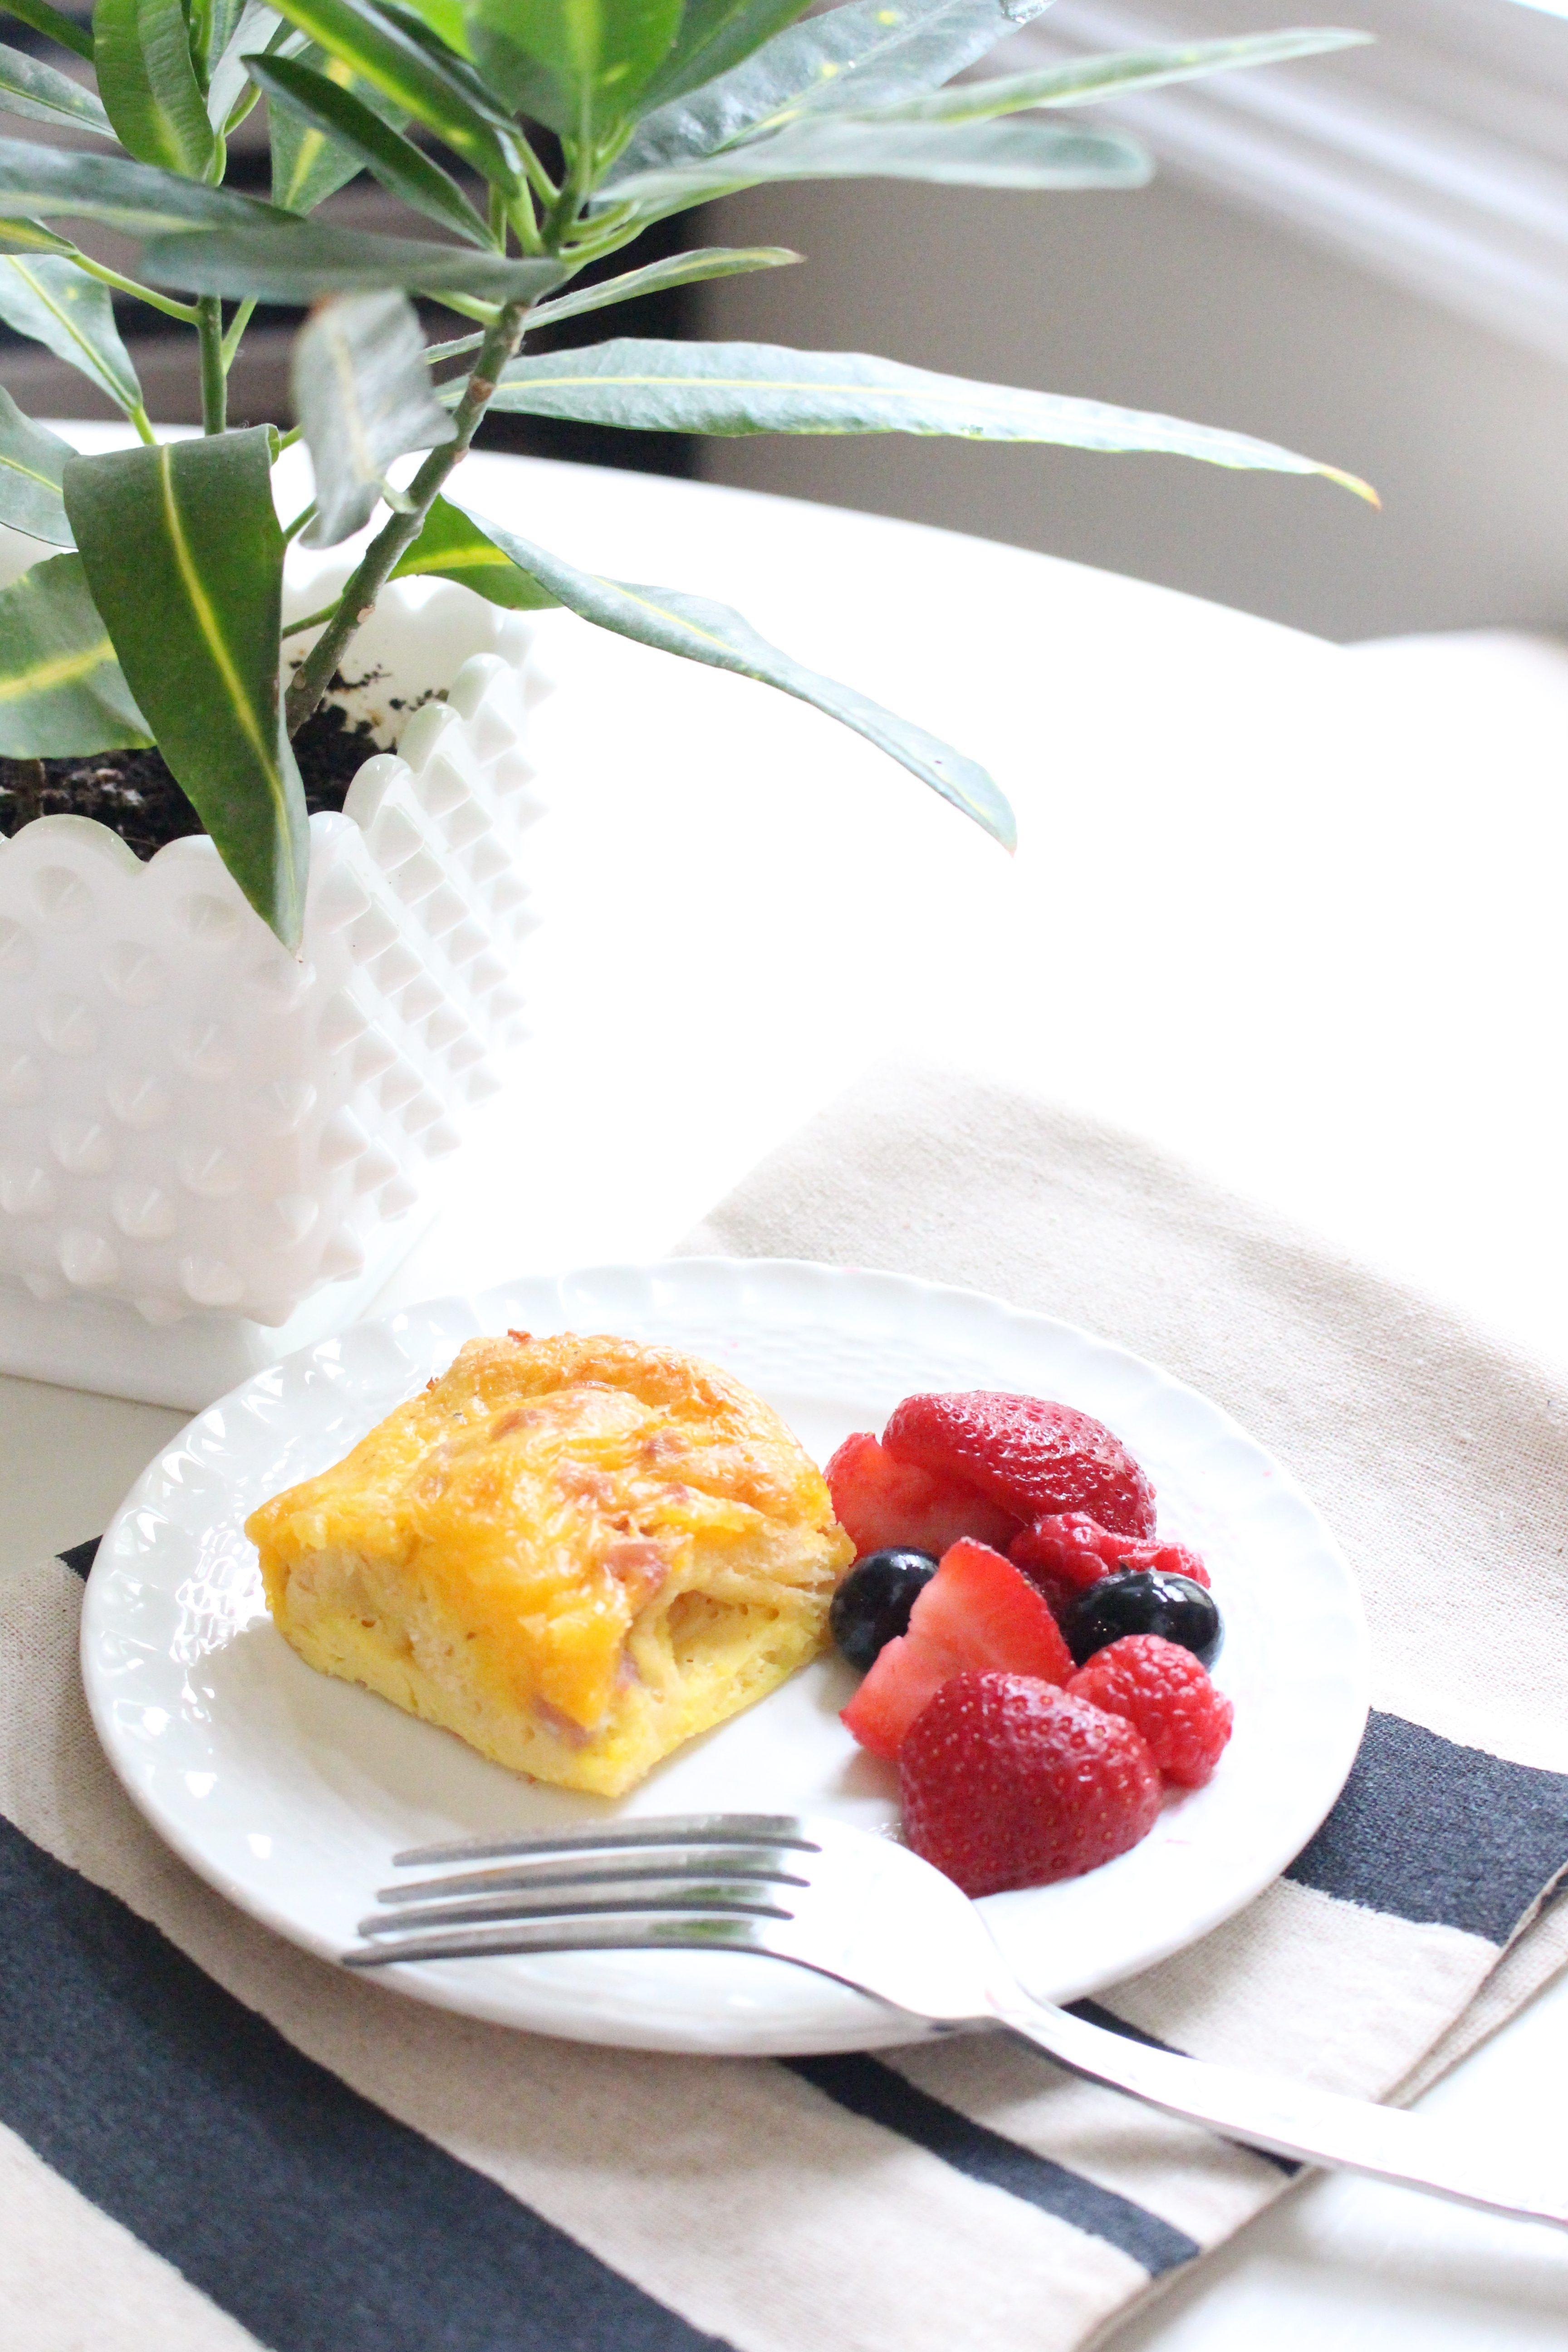 Ham and Cheese Breakfast Casserole- Breakfast Casserole- Recipes- Breakfast recipe- casseroles- food- crescent rolls- quick and easy breakfast casserole